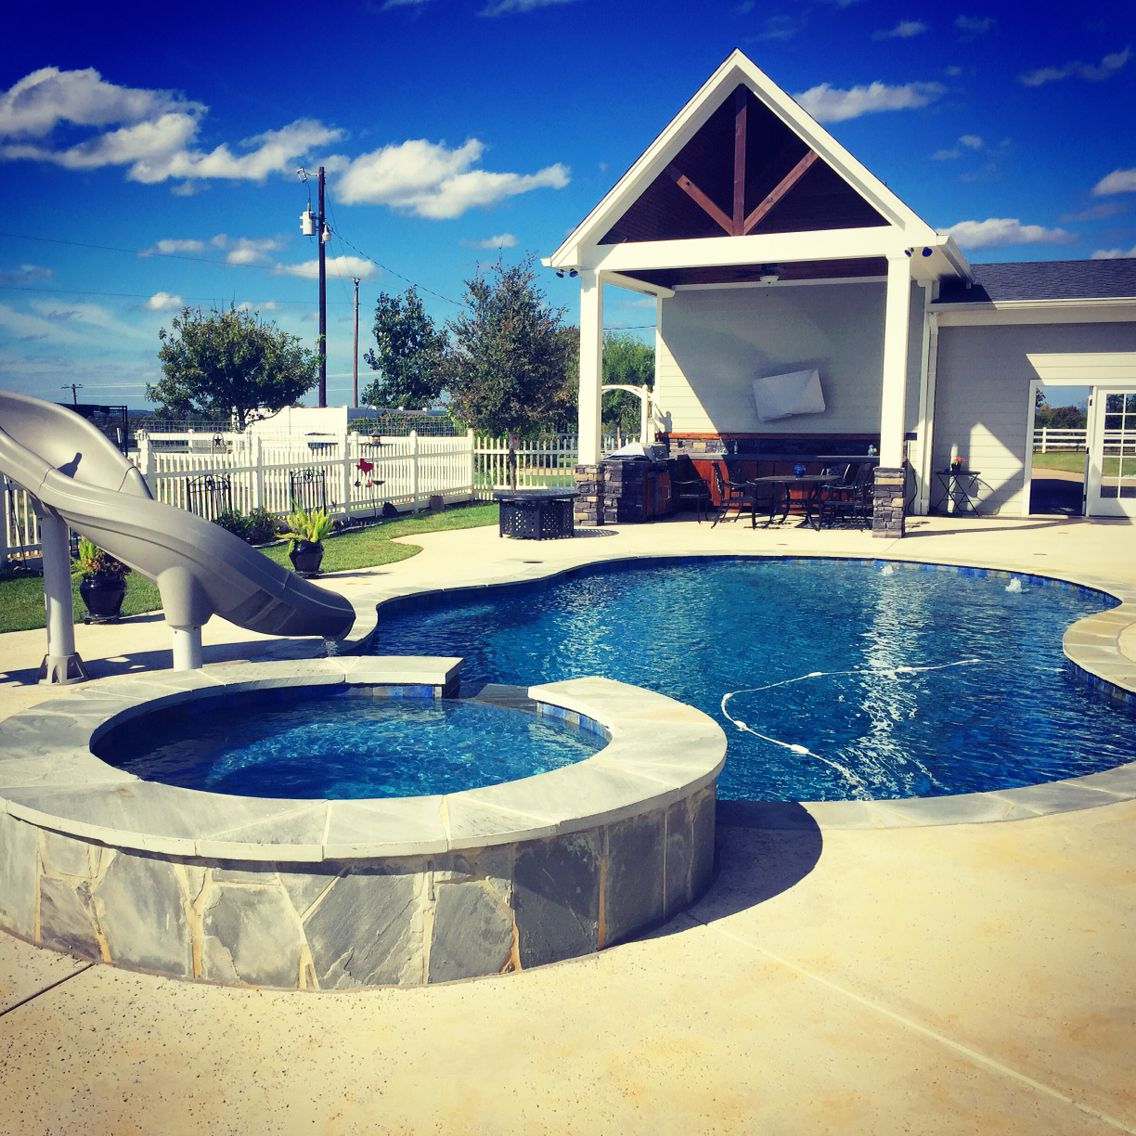 #radius #pool With #slide And #spa #hottub #flagstone #coping.  FlagstoneBackyardsOasisPoolsSpaConstructionBuildingSwimming ...